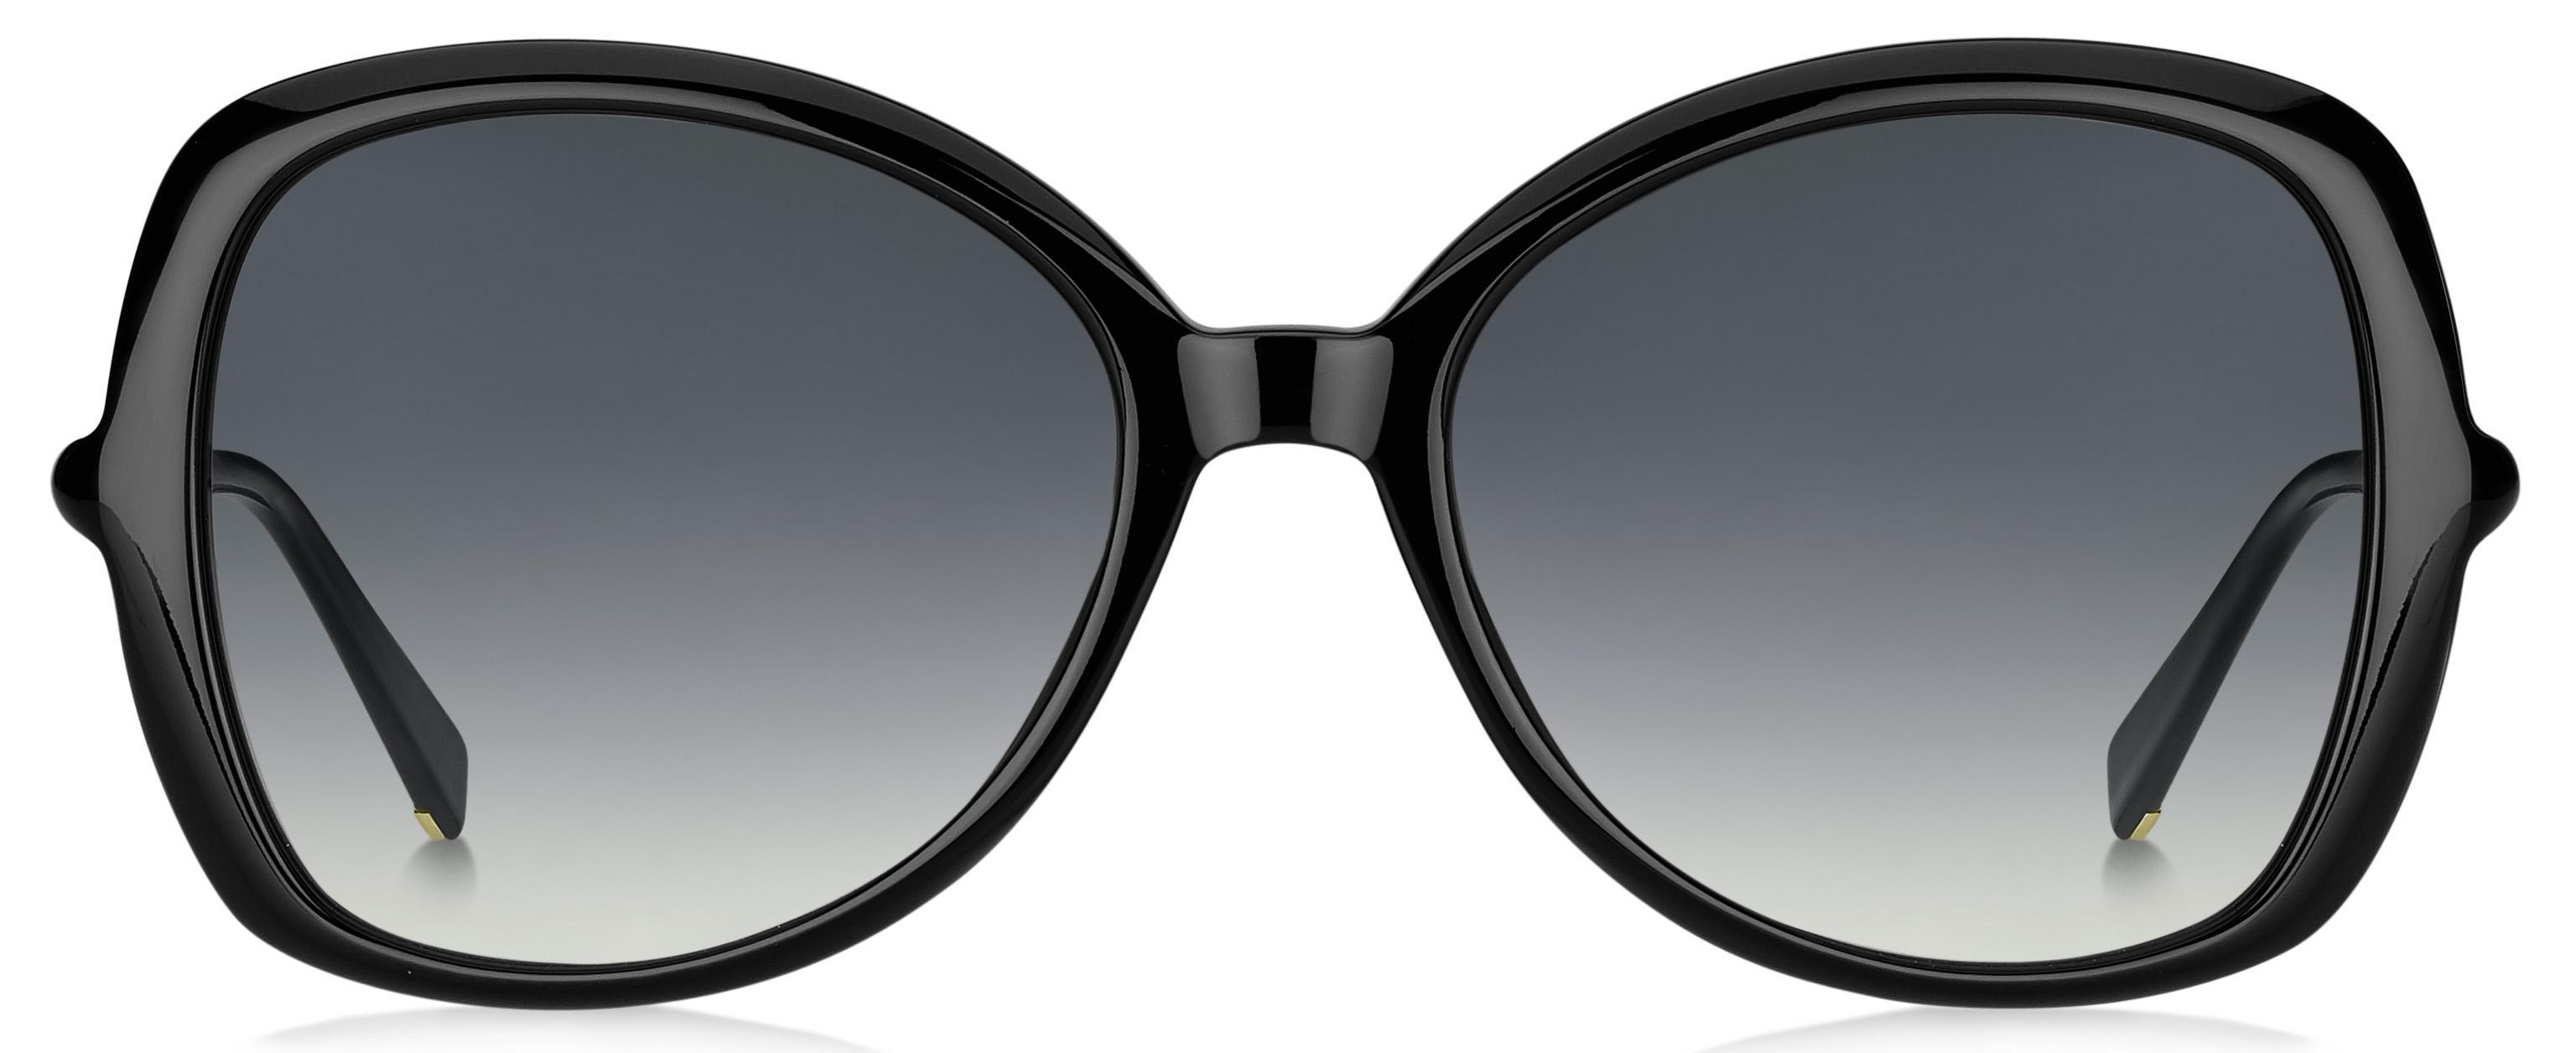 b14b6bc3edcc Lyst - Max Mara Ring Cat Eye Sunglasses in Black